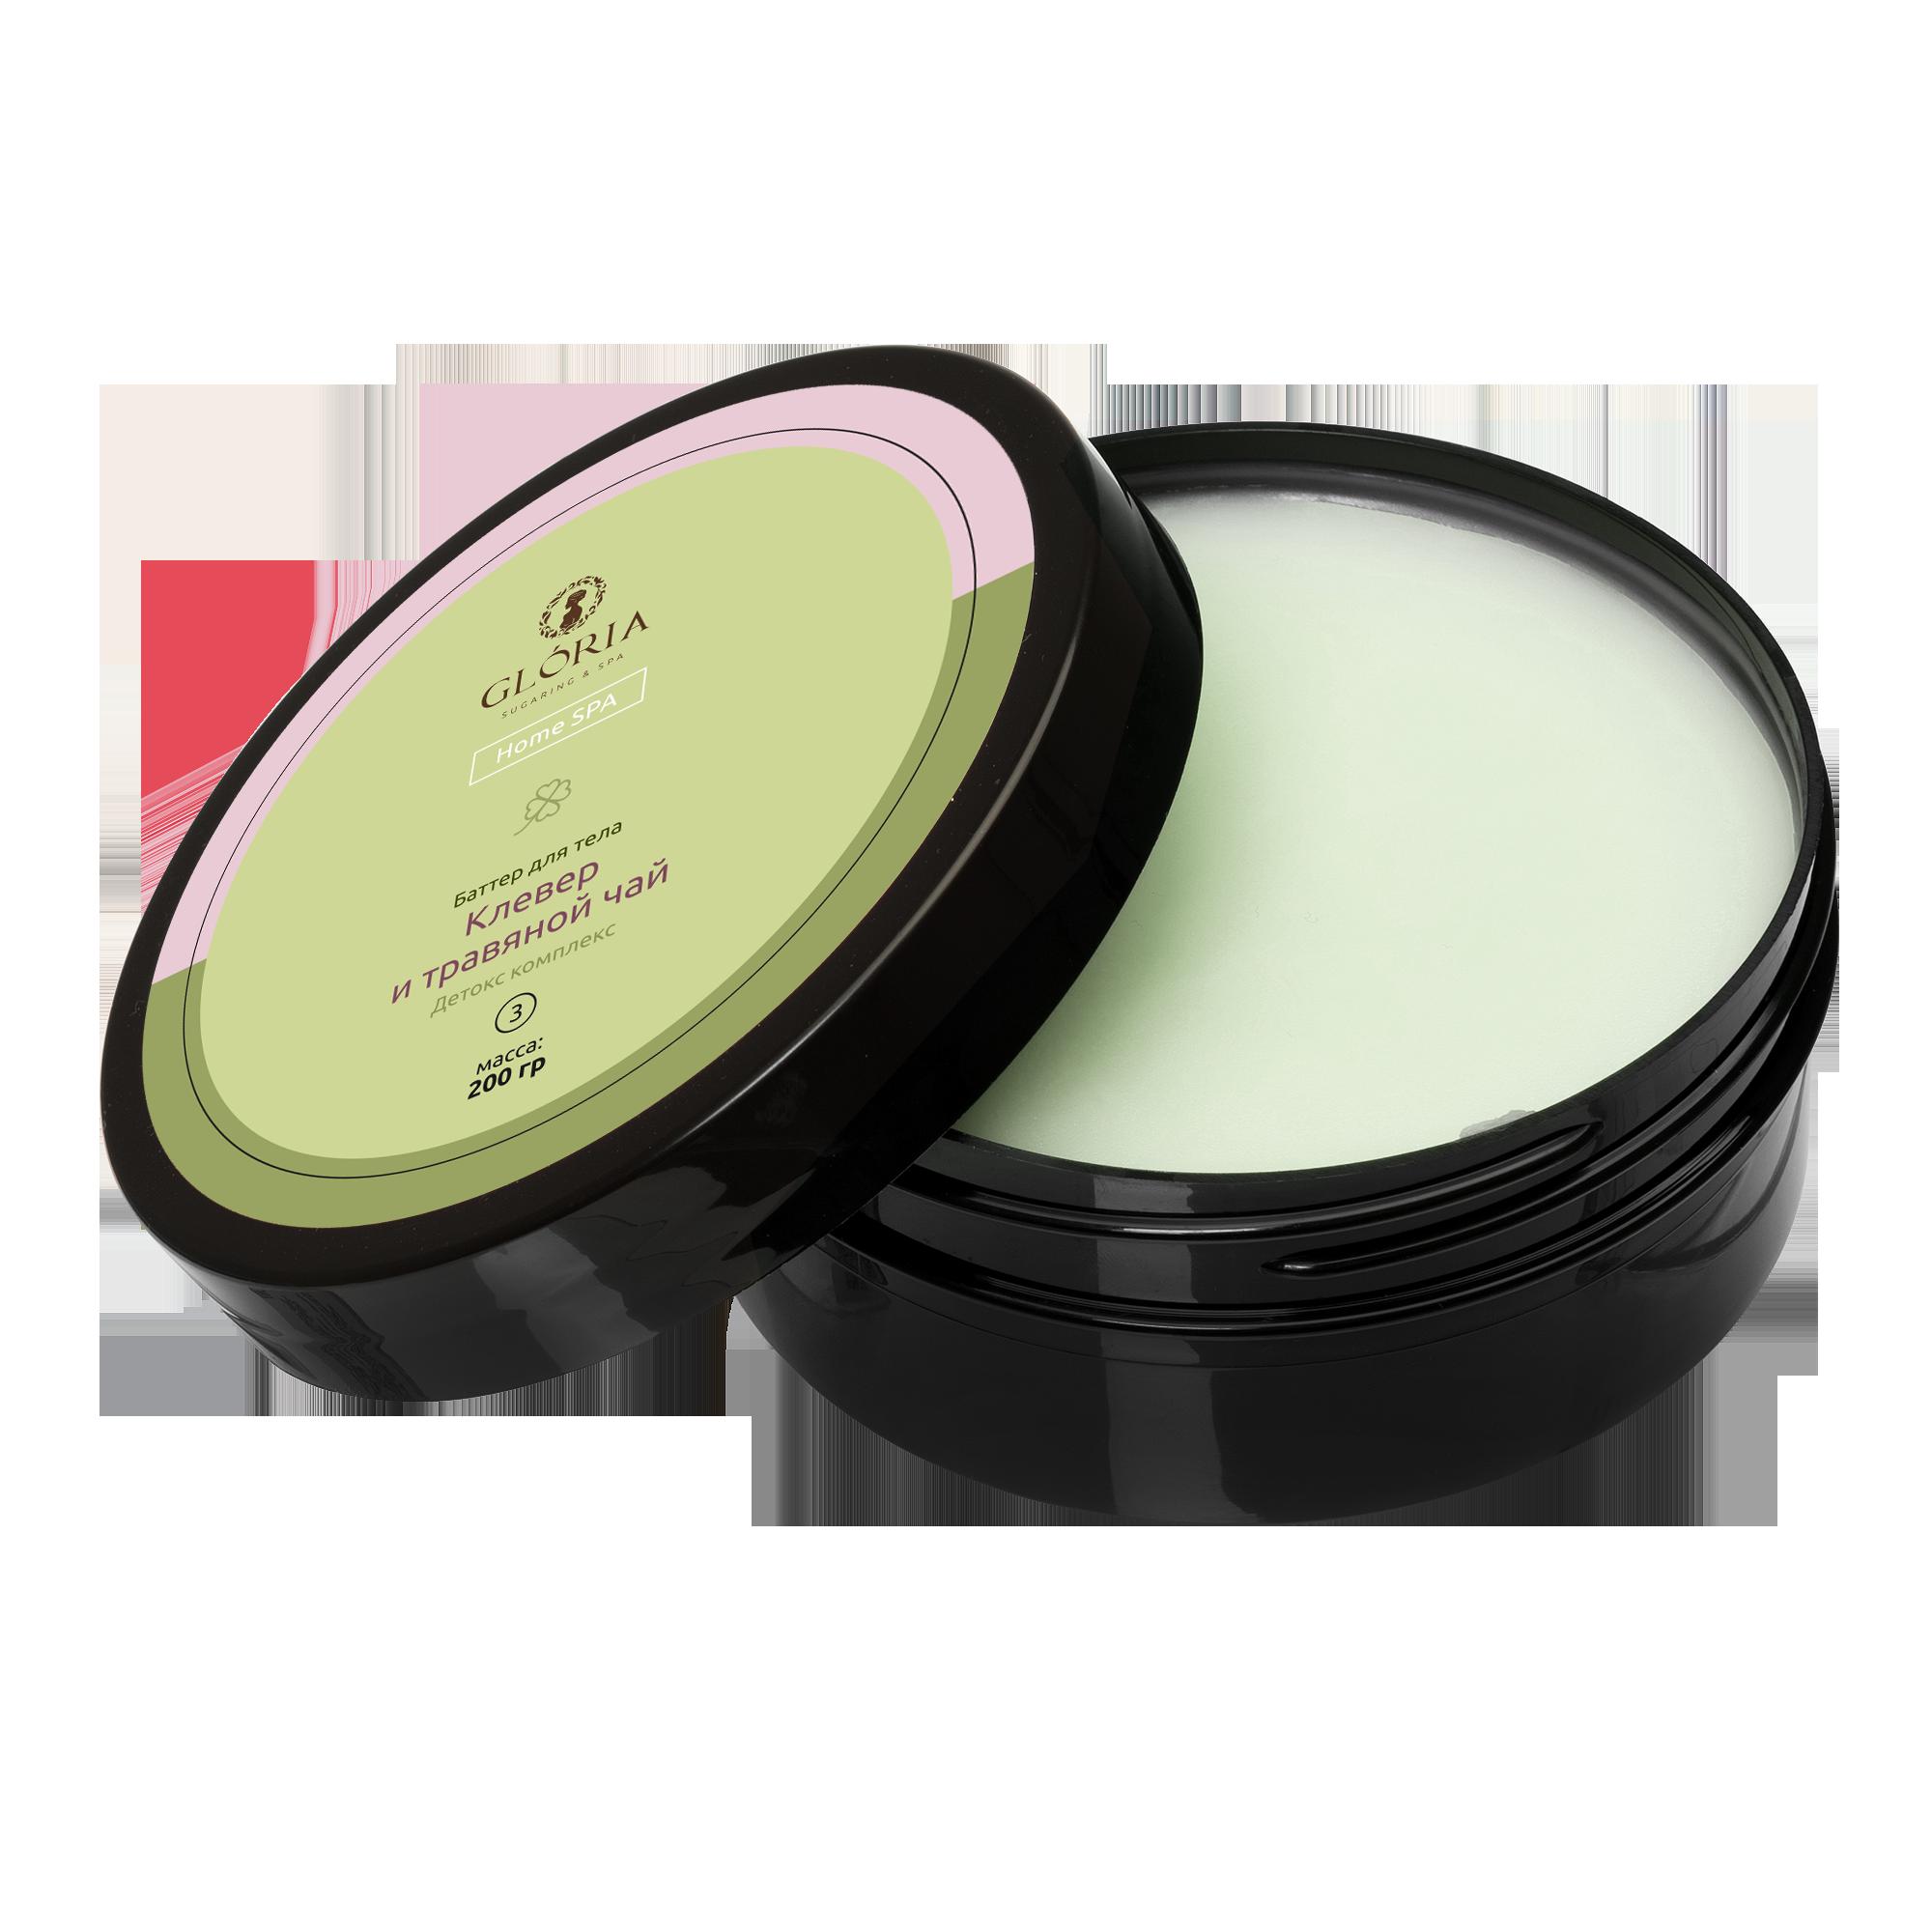 GLORIA Баттер для тела & Клевер и травяной чай&  200гр -  Масла